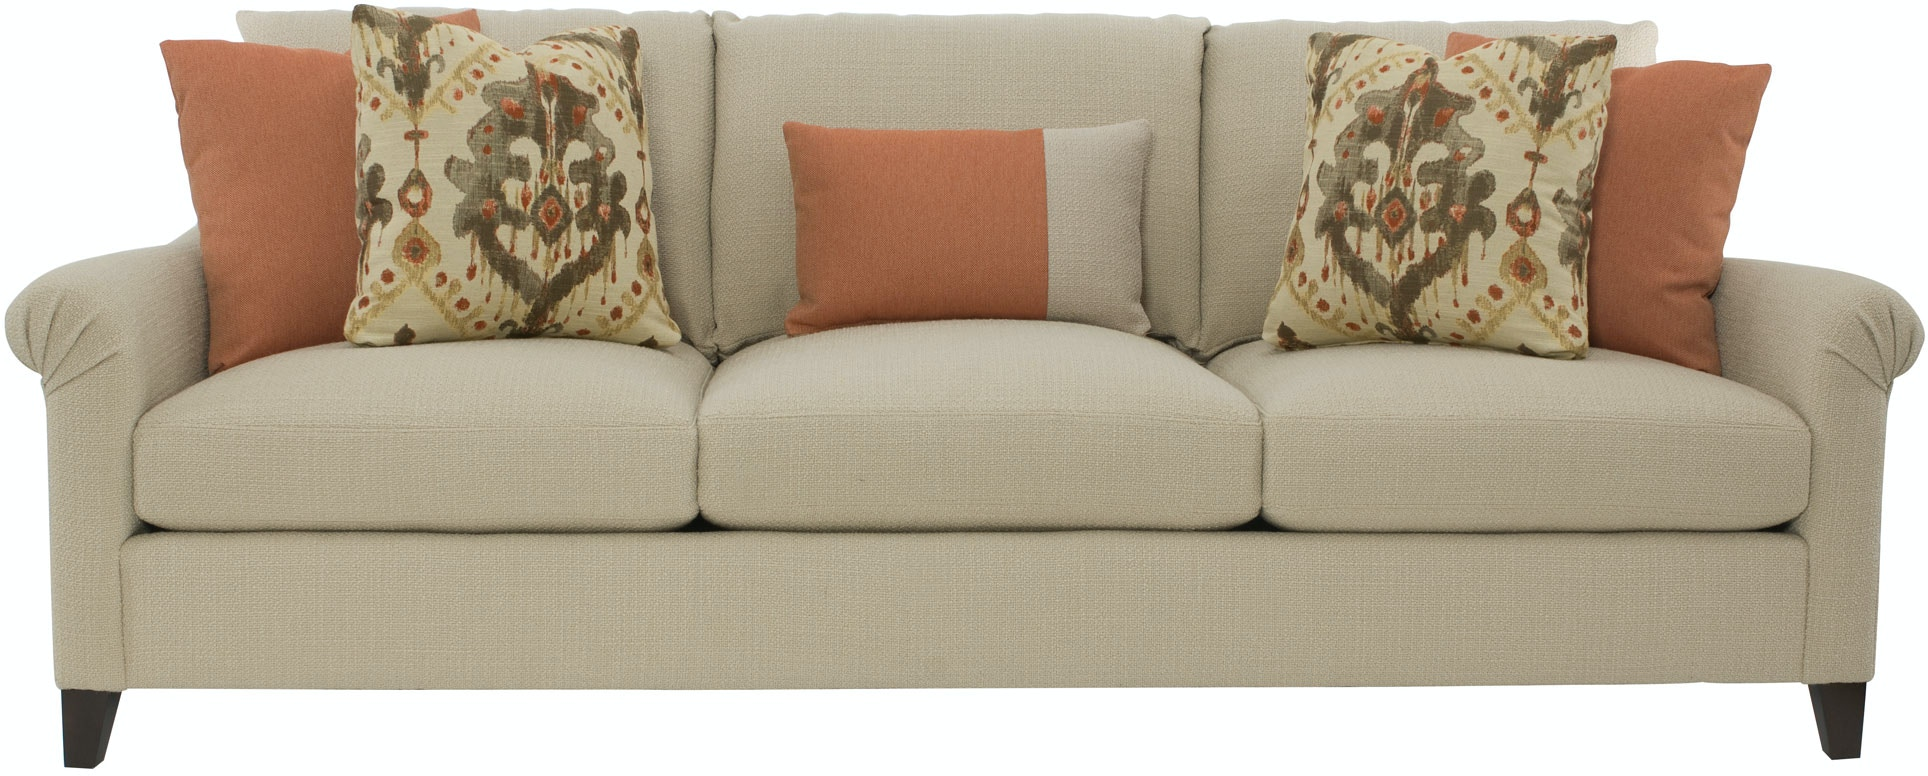 Bernhardt Furniture B9857 Living Room Sherman Sofa